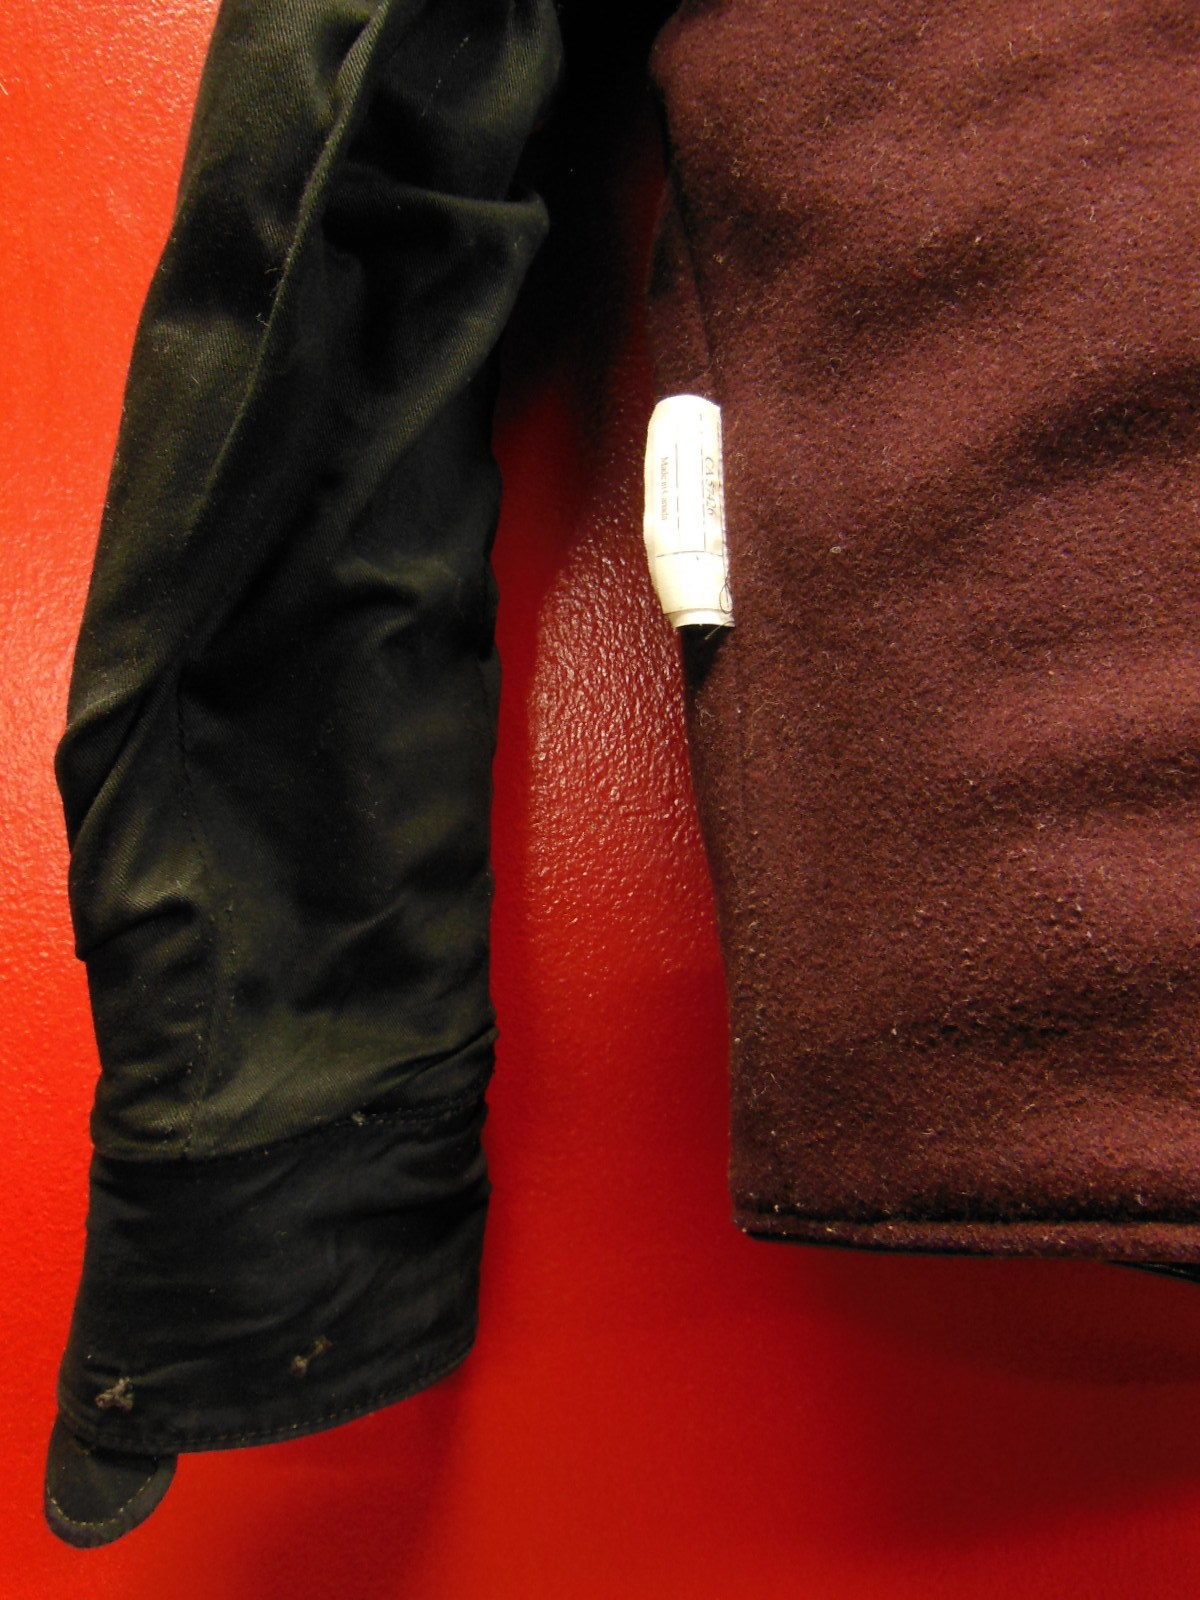 USED HIMEL BROTHERS LEATHER HERON 1929/新喜皮革製黒ホースハイド/SIZE-36/ボタンフロント A-1 ジャケット_c0187684_15063630.jpg